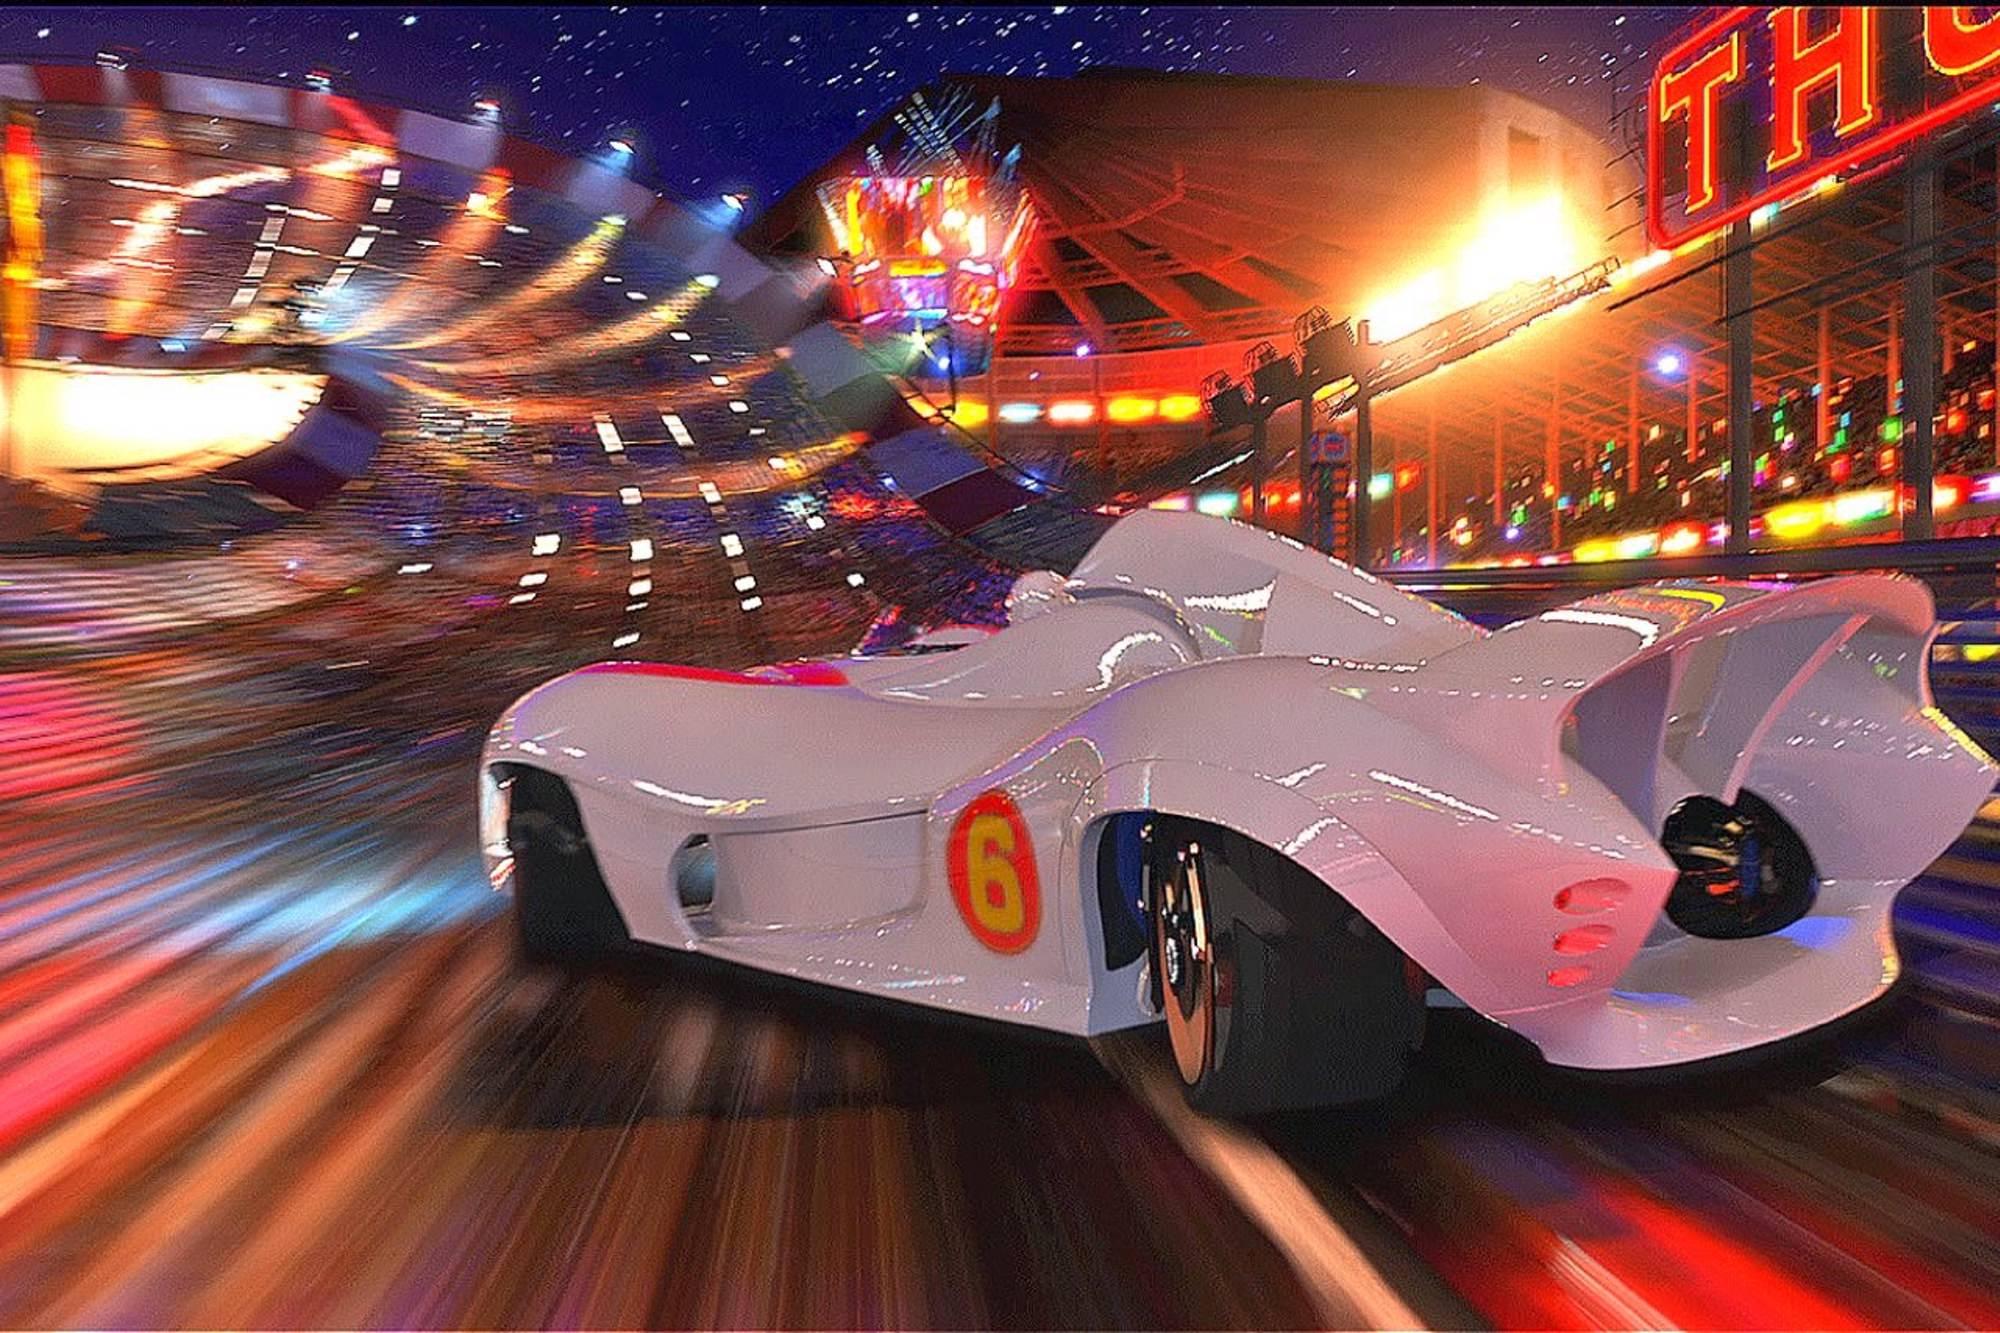 Film Captain Harlock Wachowski-speed-racer